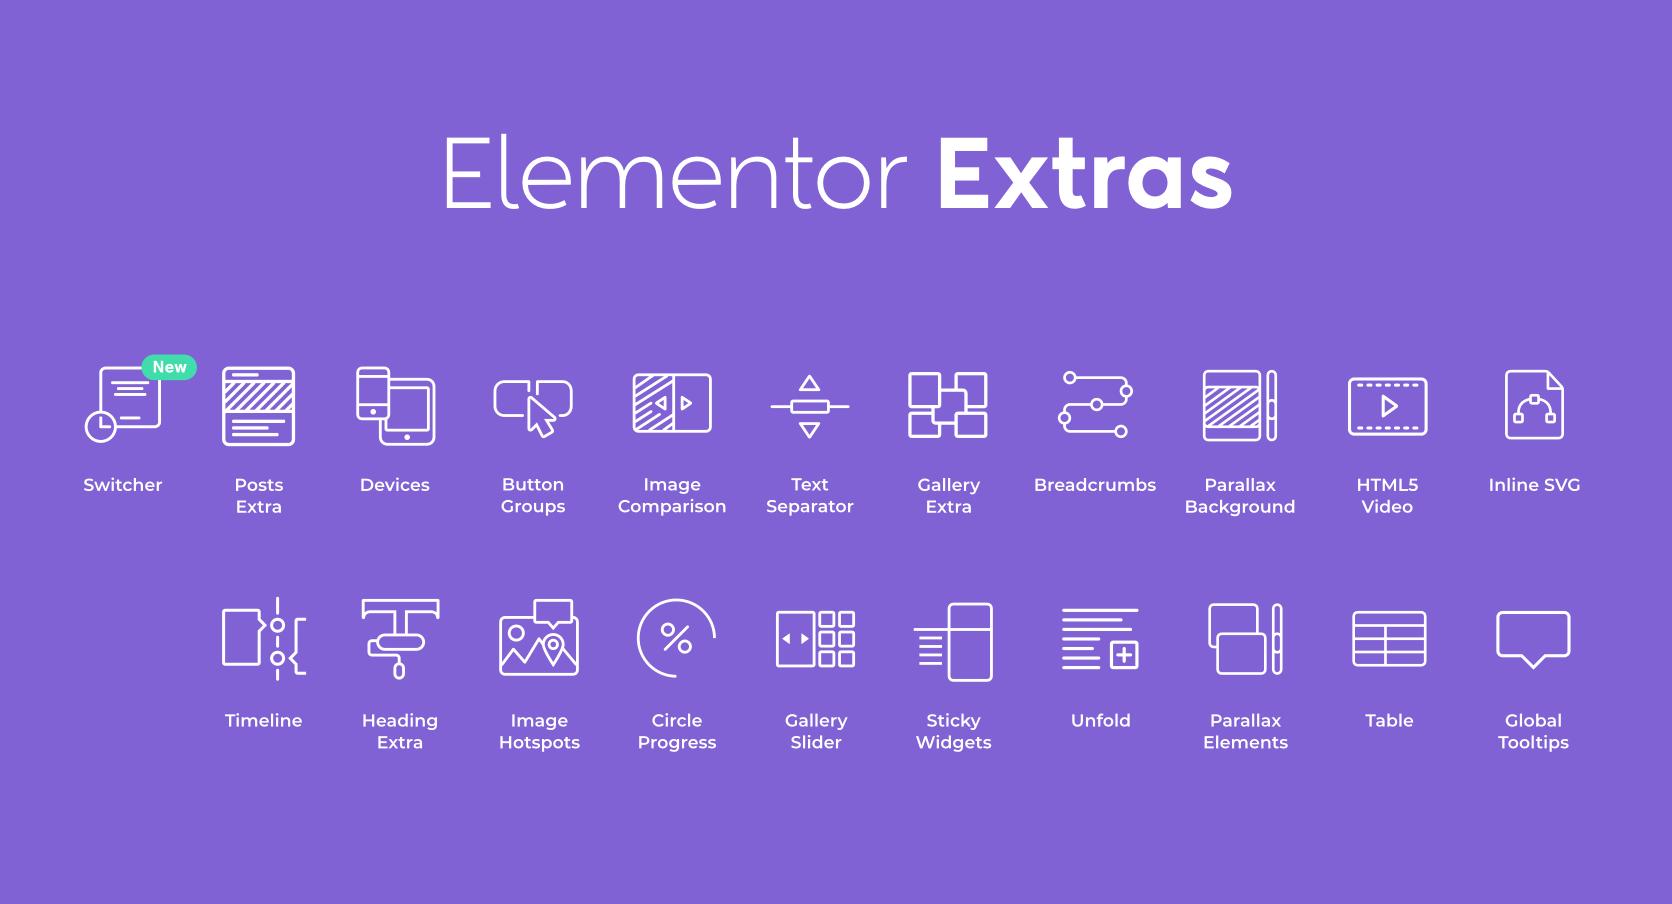 Elementor Extras v2.2.39 – Do more with Elementor